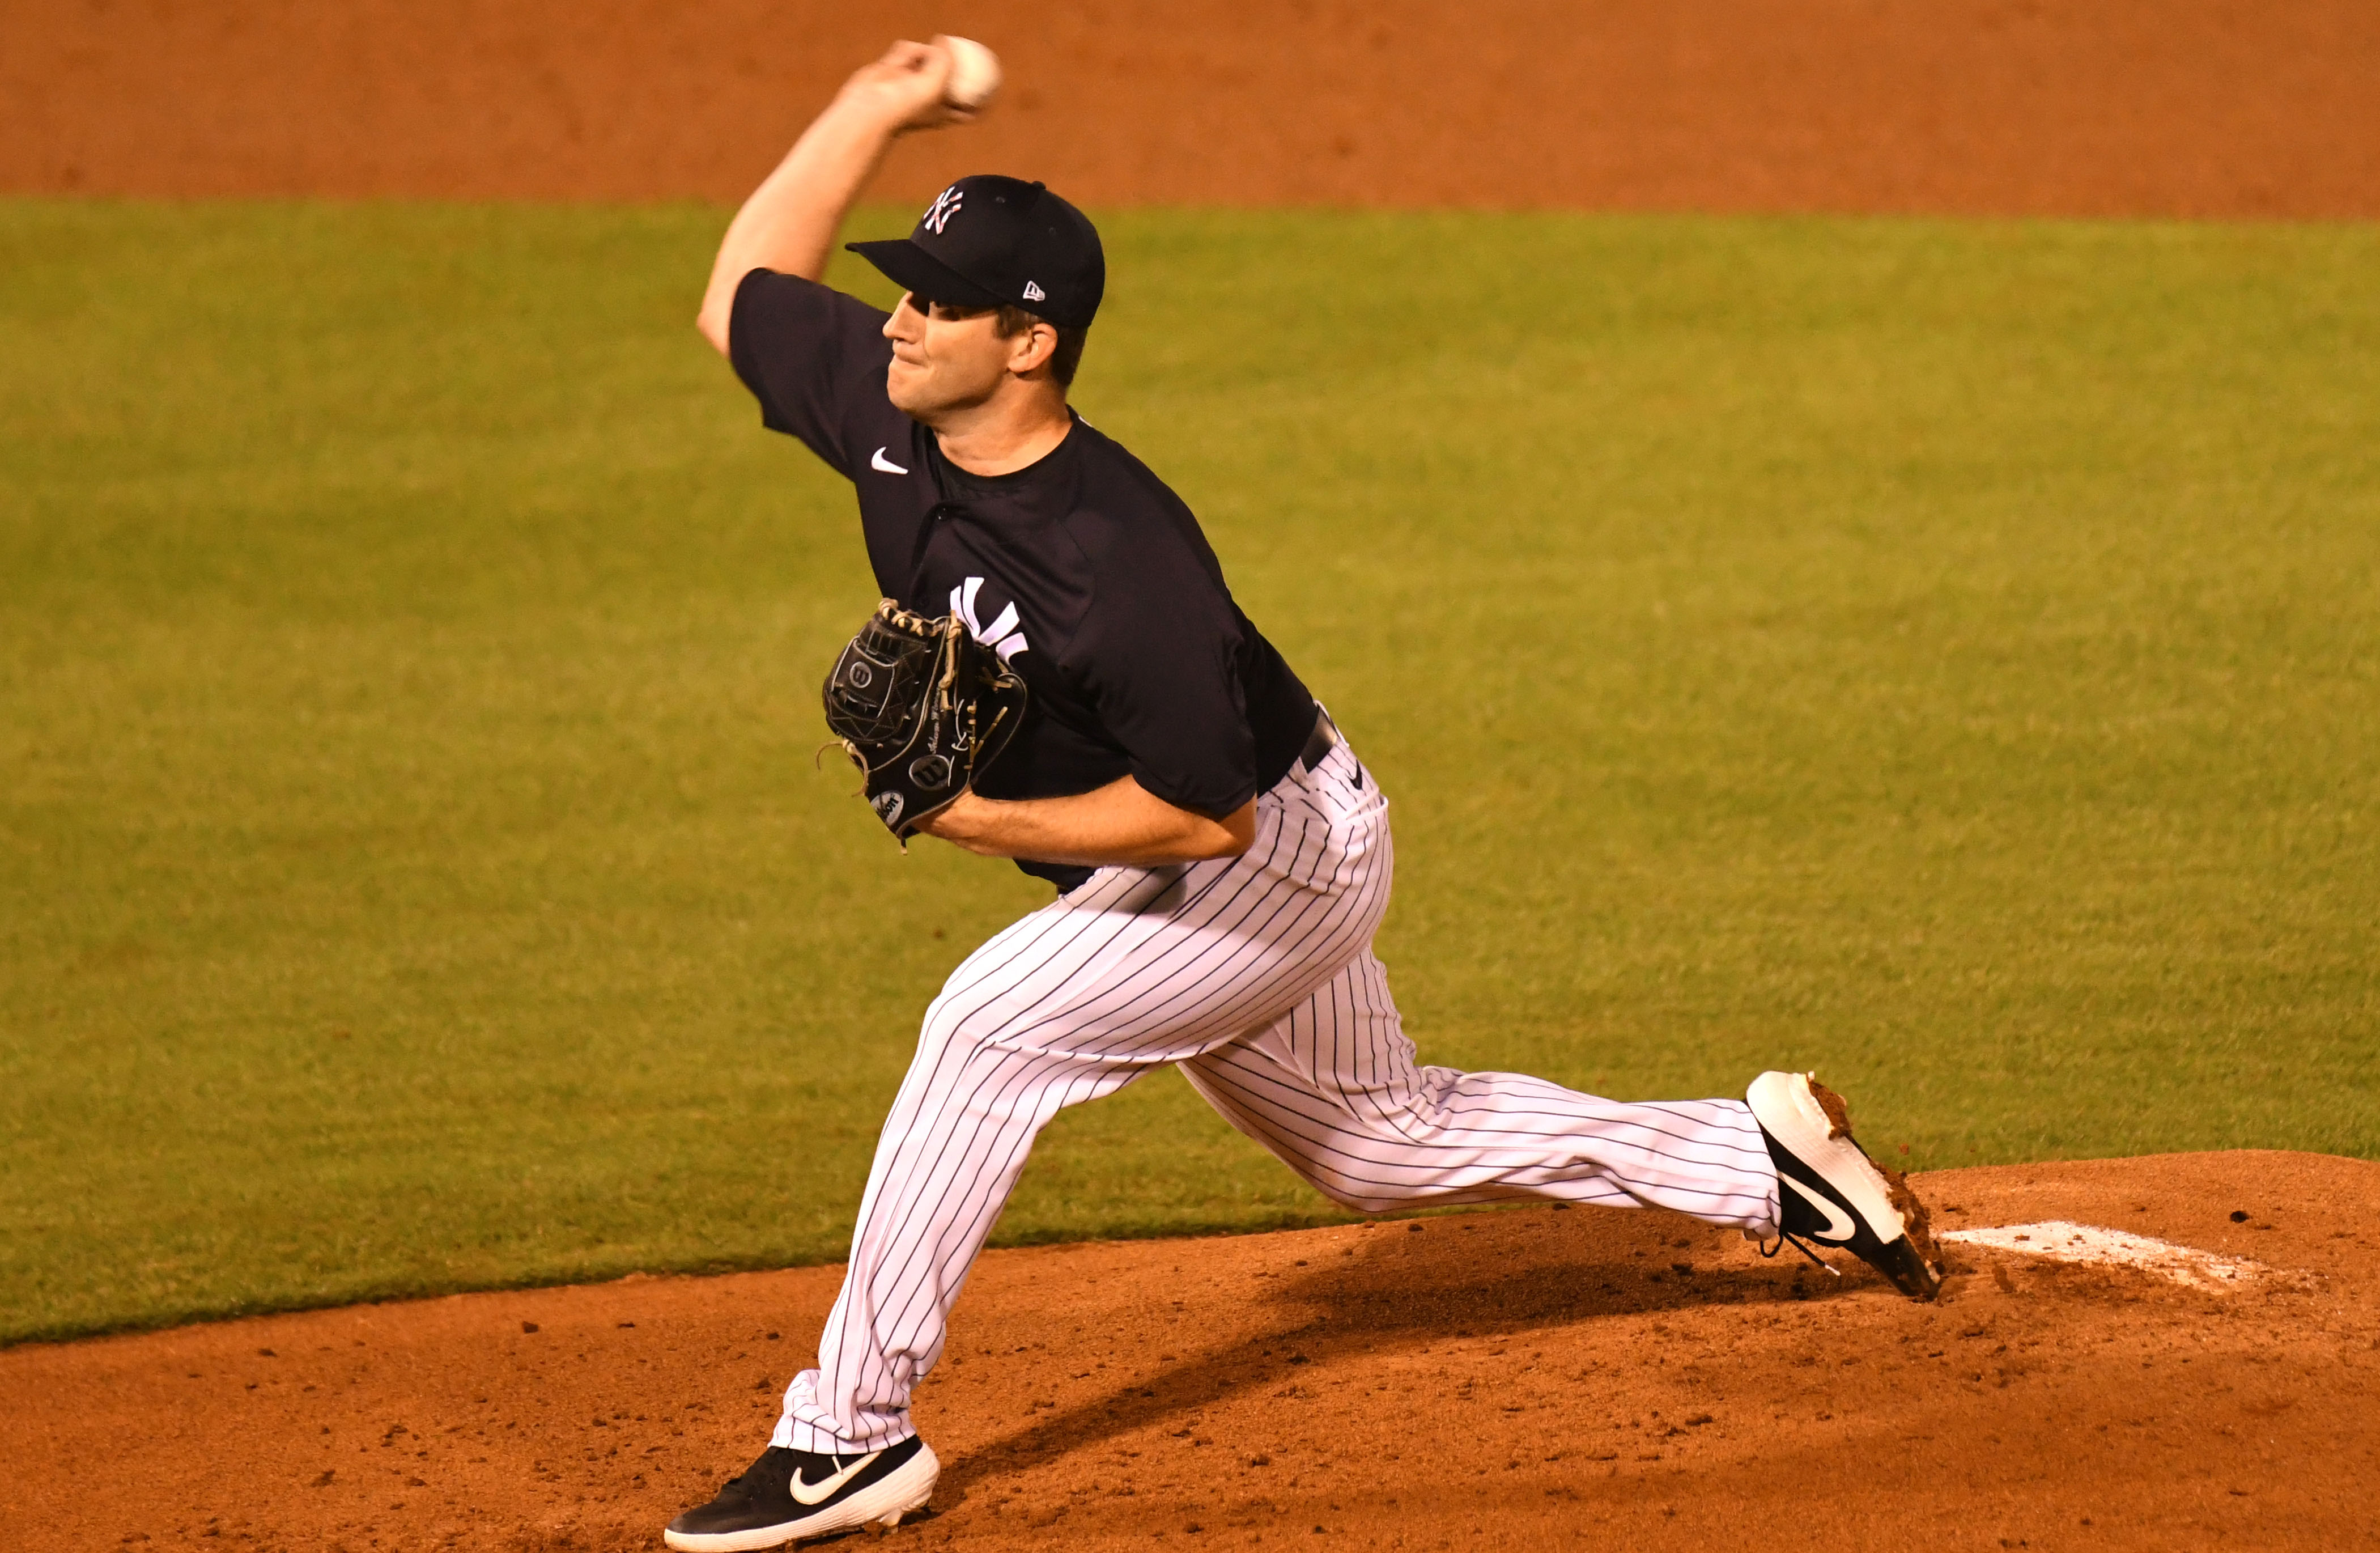 MLB: Toronto Blue Jays at New York Yankees